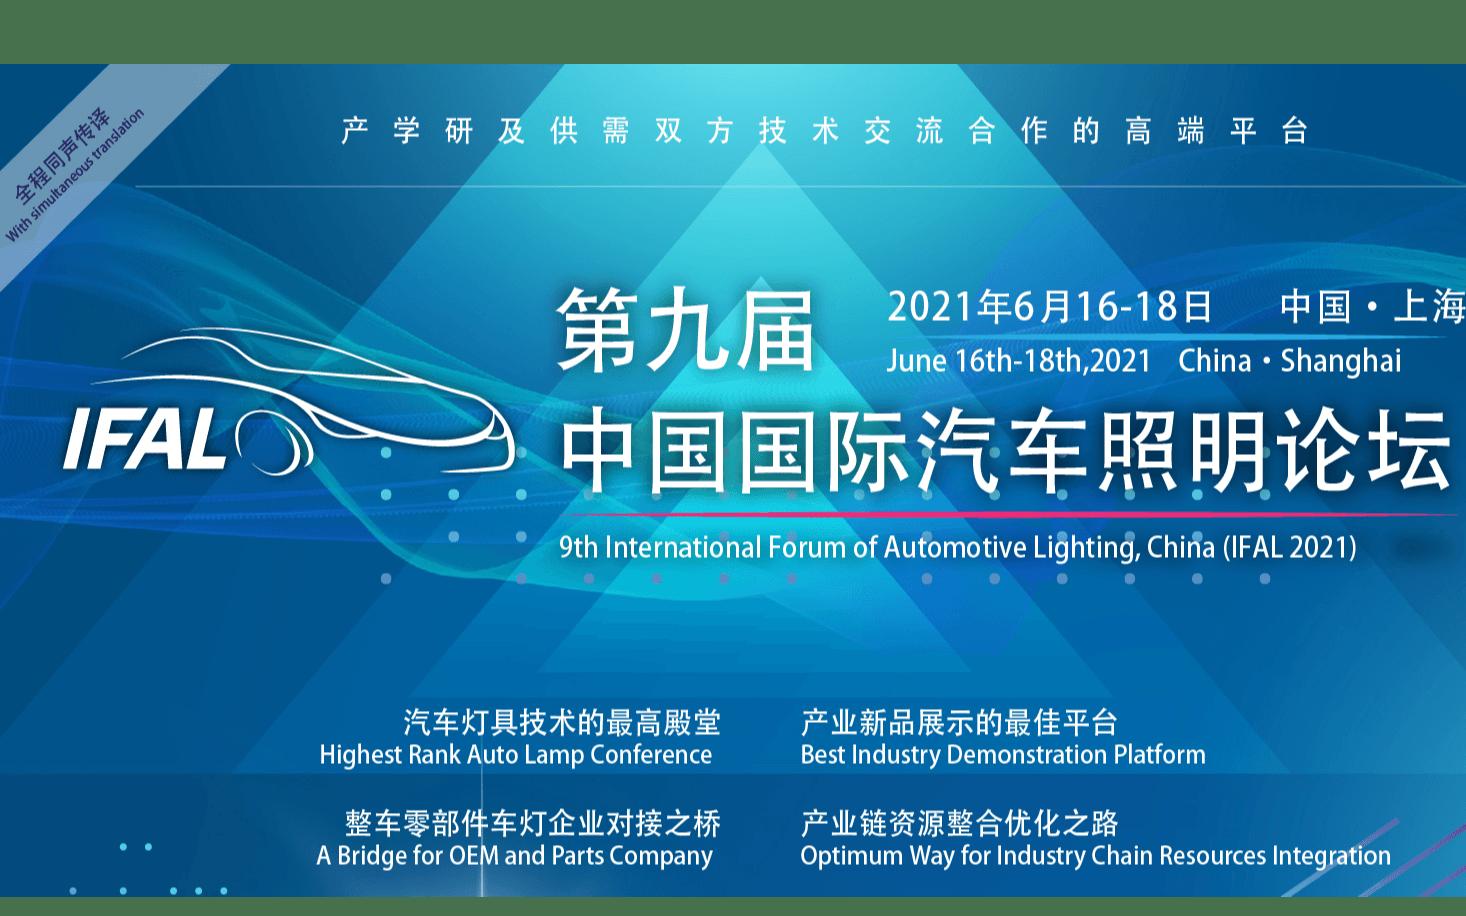 2021第九届中国国际汽车照明论坛(IFAL)